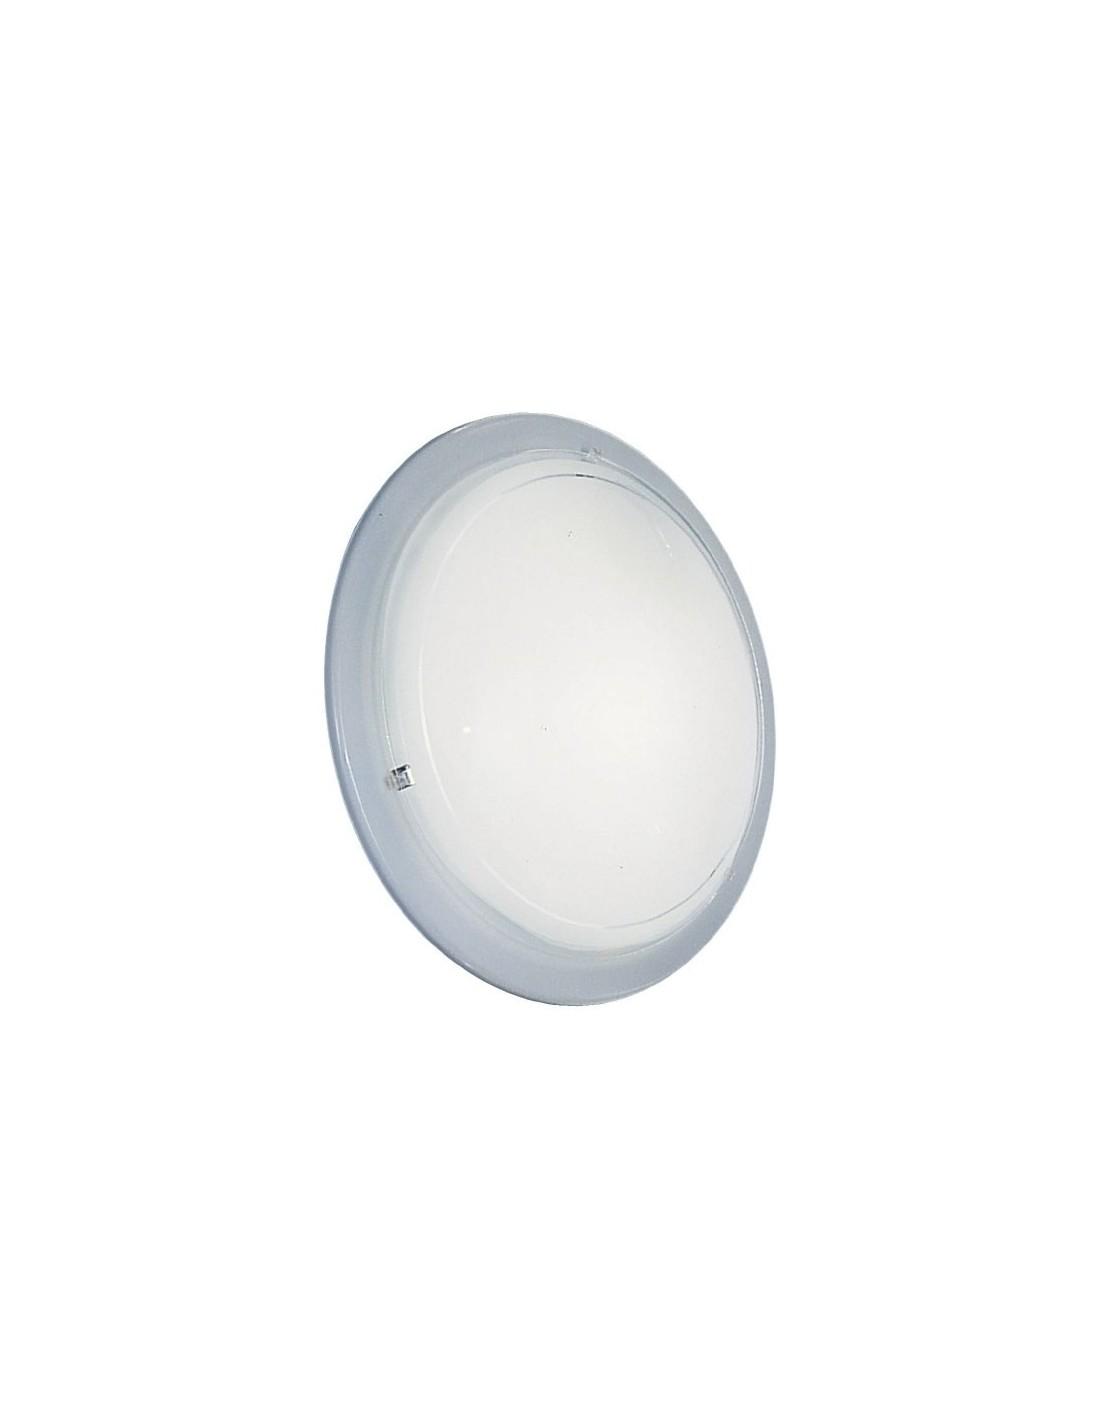 plafonnier metal verre blanc plafonnier metal verre blanc. Black Bedroom Furniture Sets. Home Design Ideas